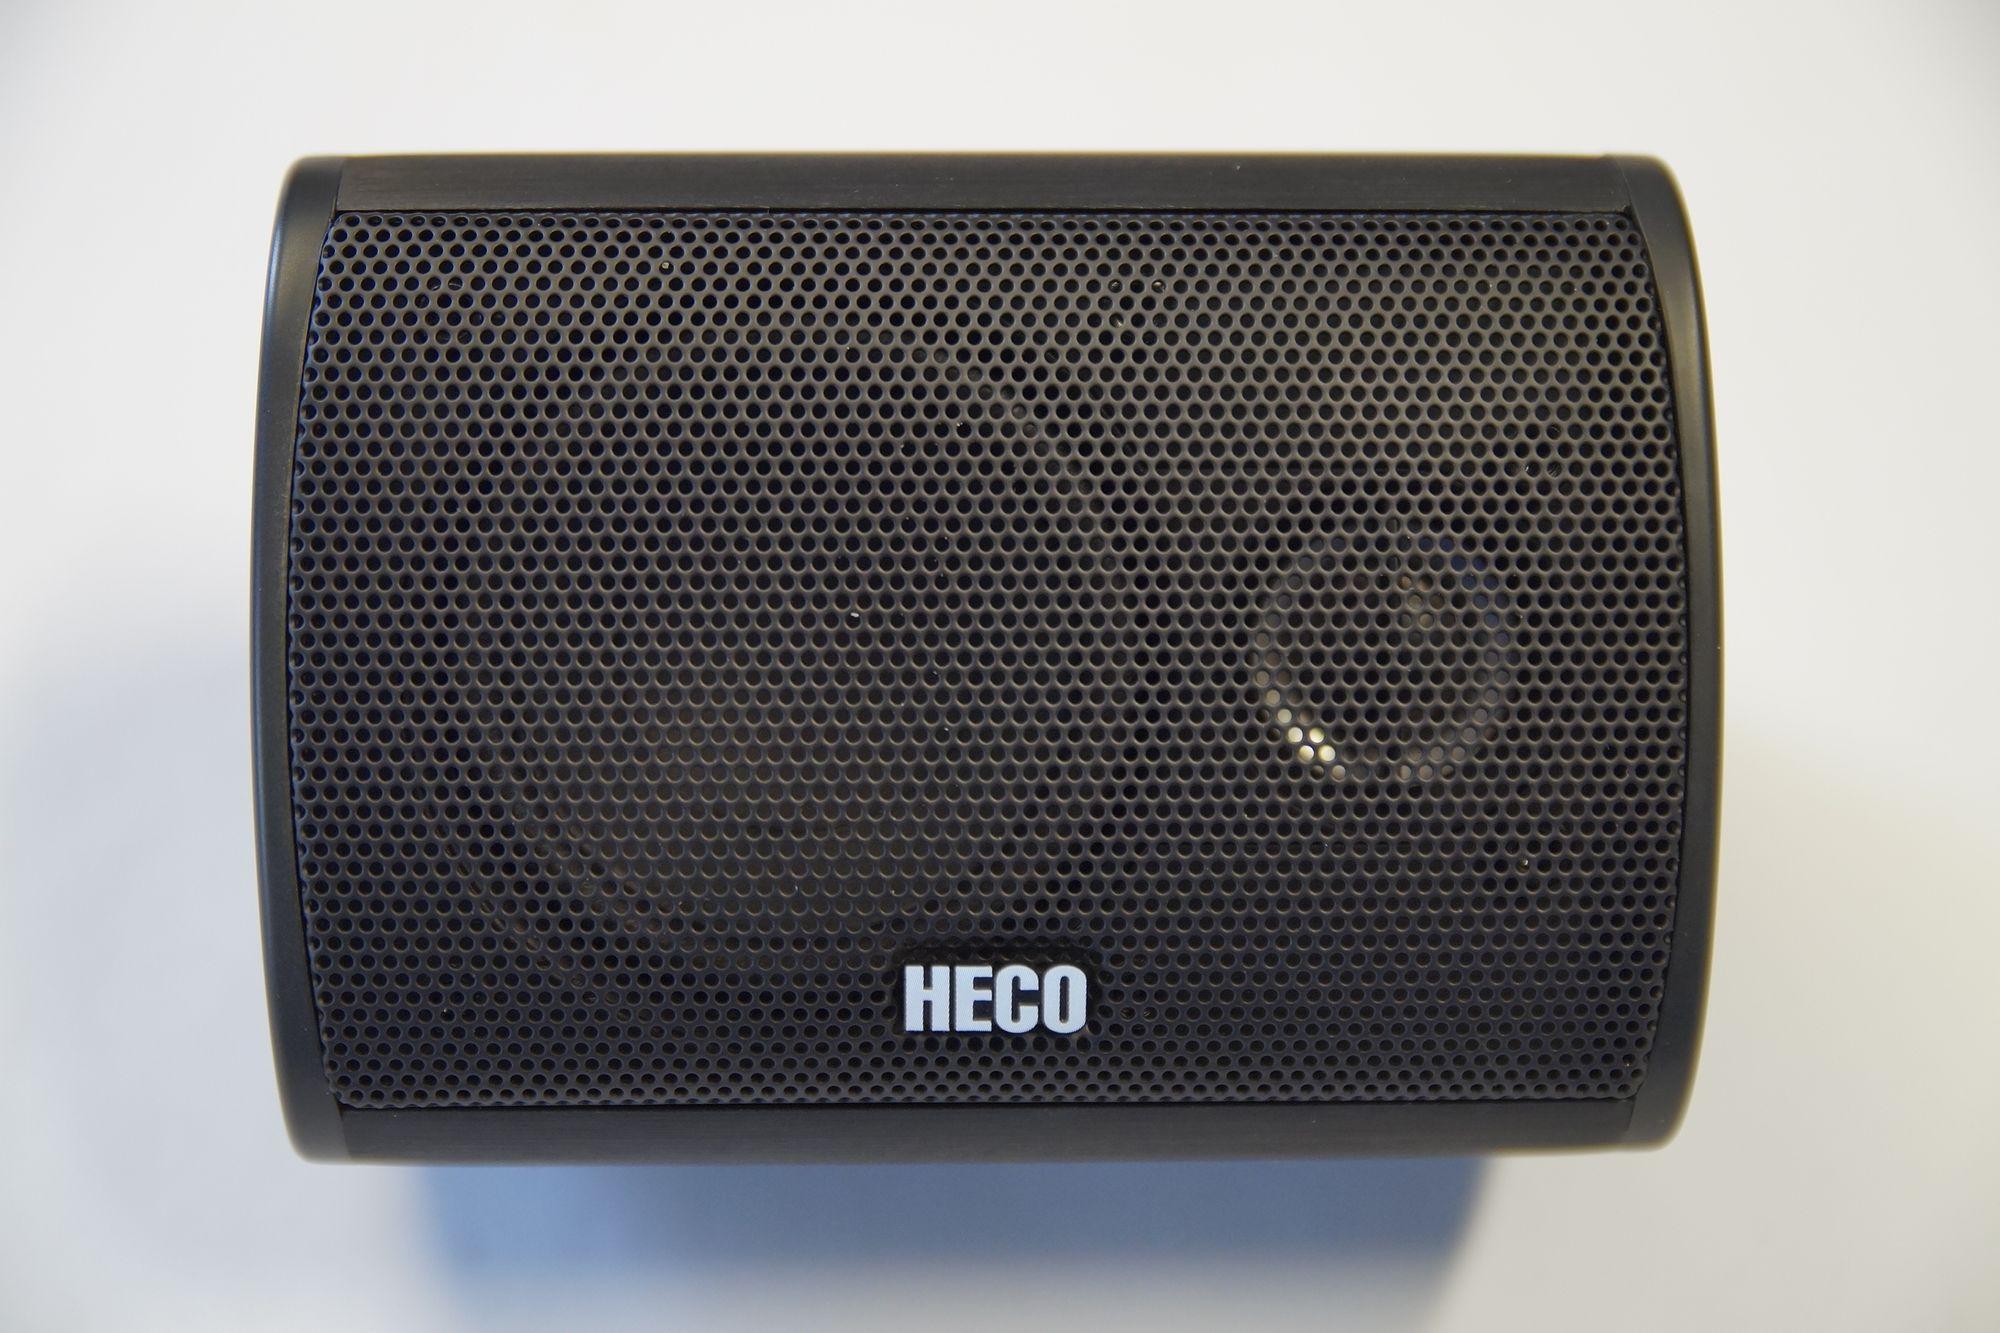 1 Stück Heco Vogue 510 Aluminium Center Lautsprecher schwarz Neu